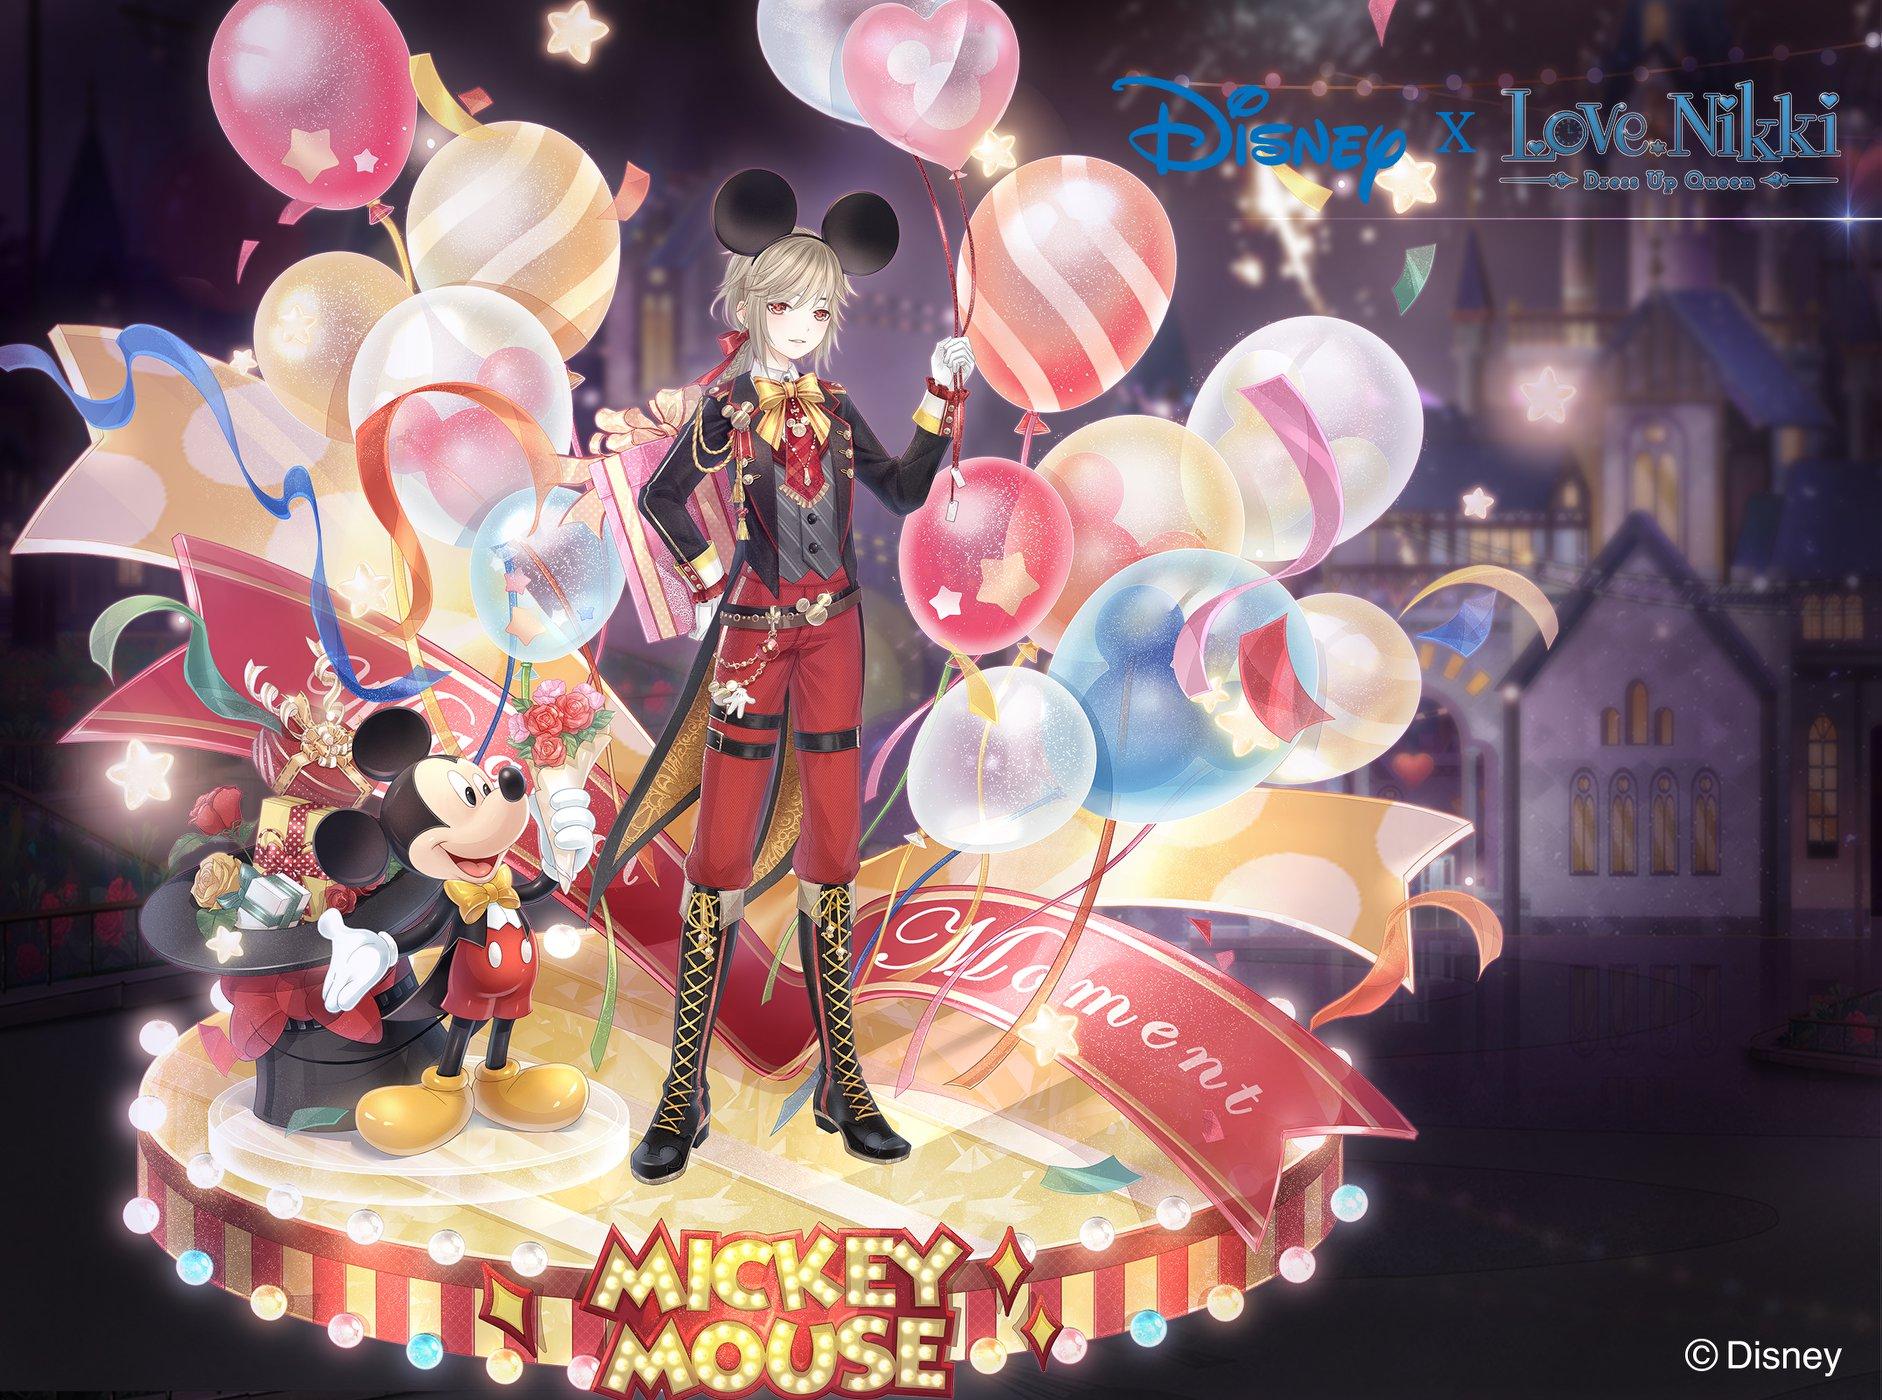 Epic Magic ♥Mickey